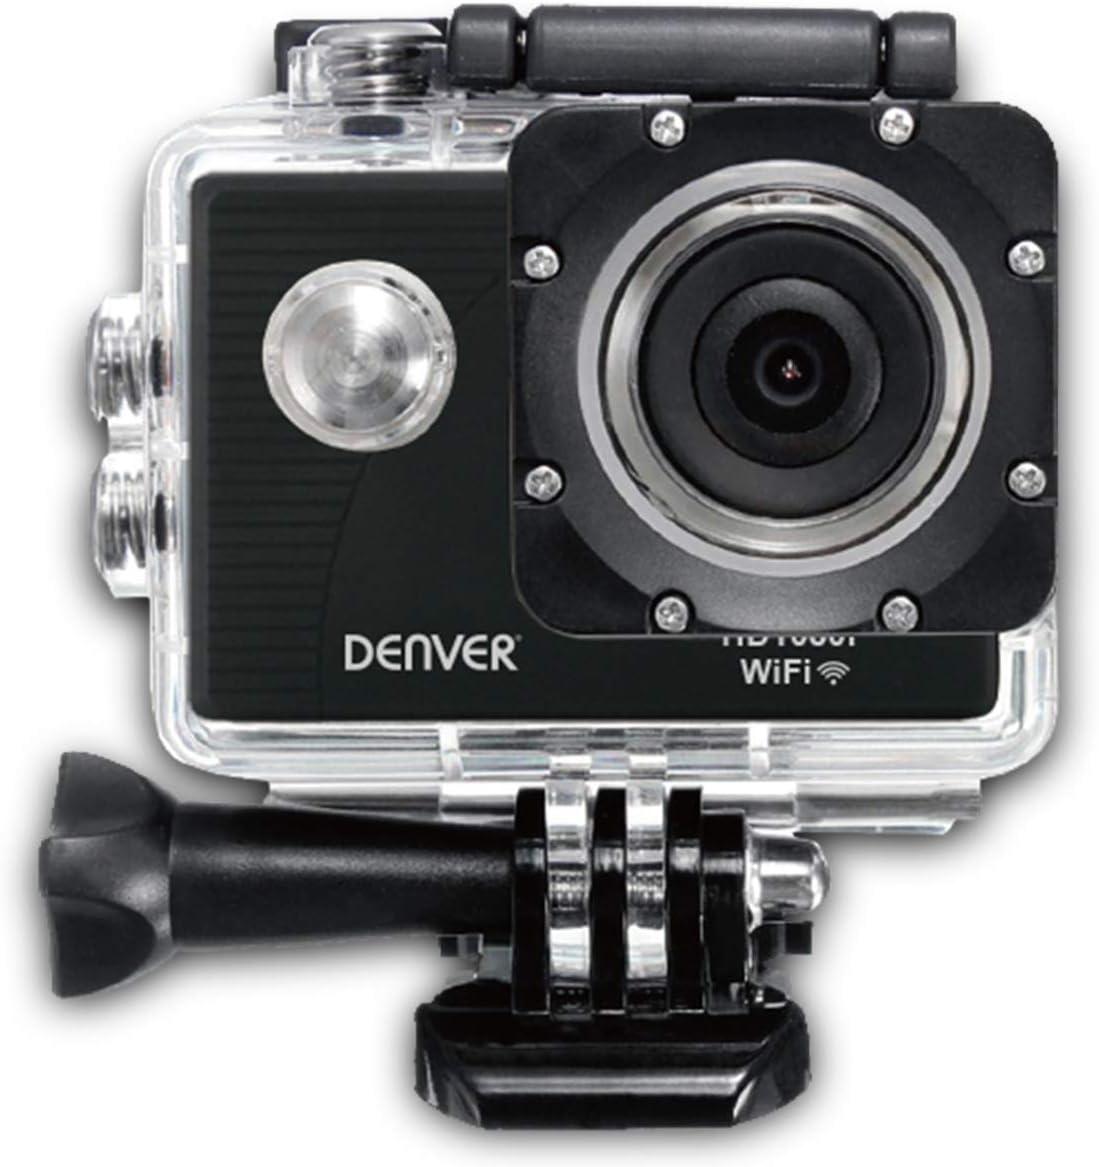 Denver Act 5051 Action Cam Waterproof Full Hd Wifi Elektronik